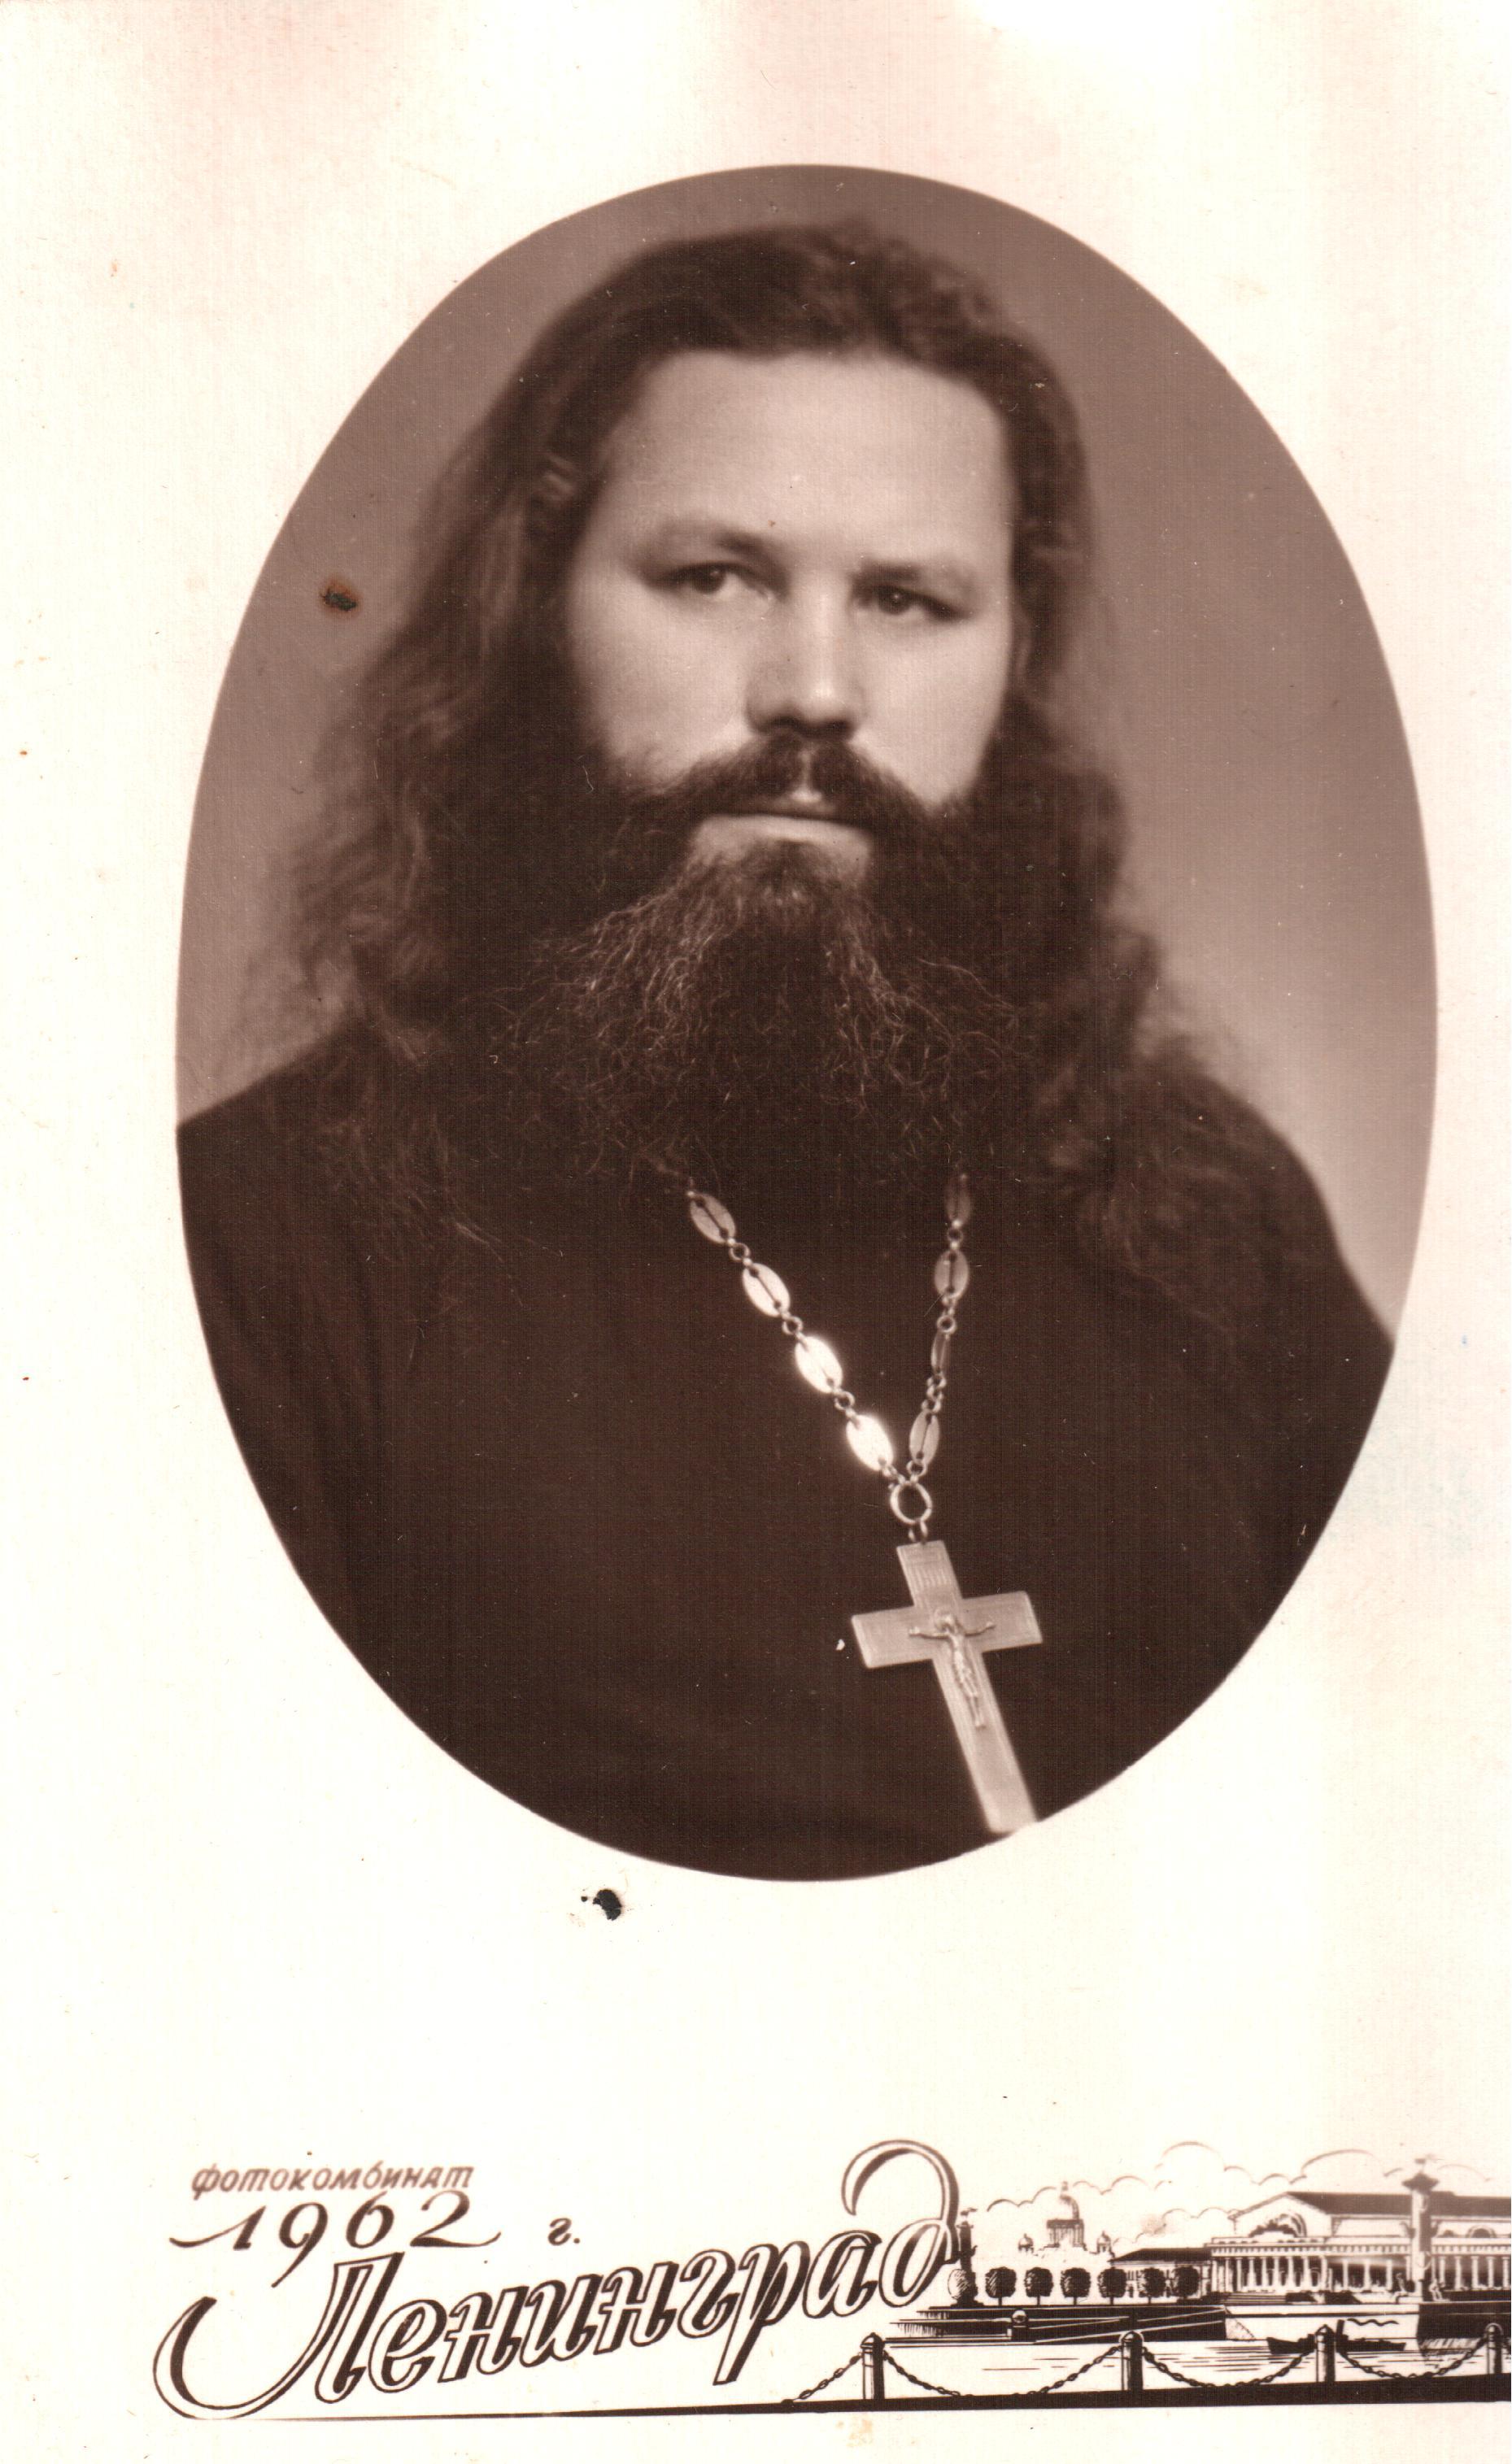 1962. Добрянка. Отец Александр